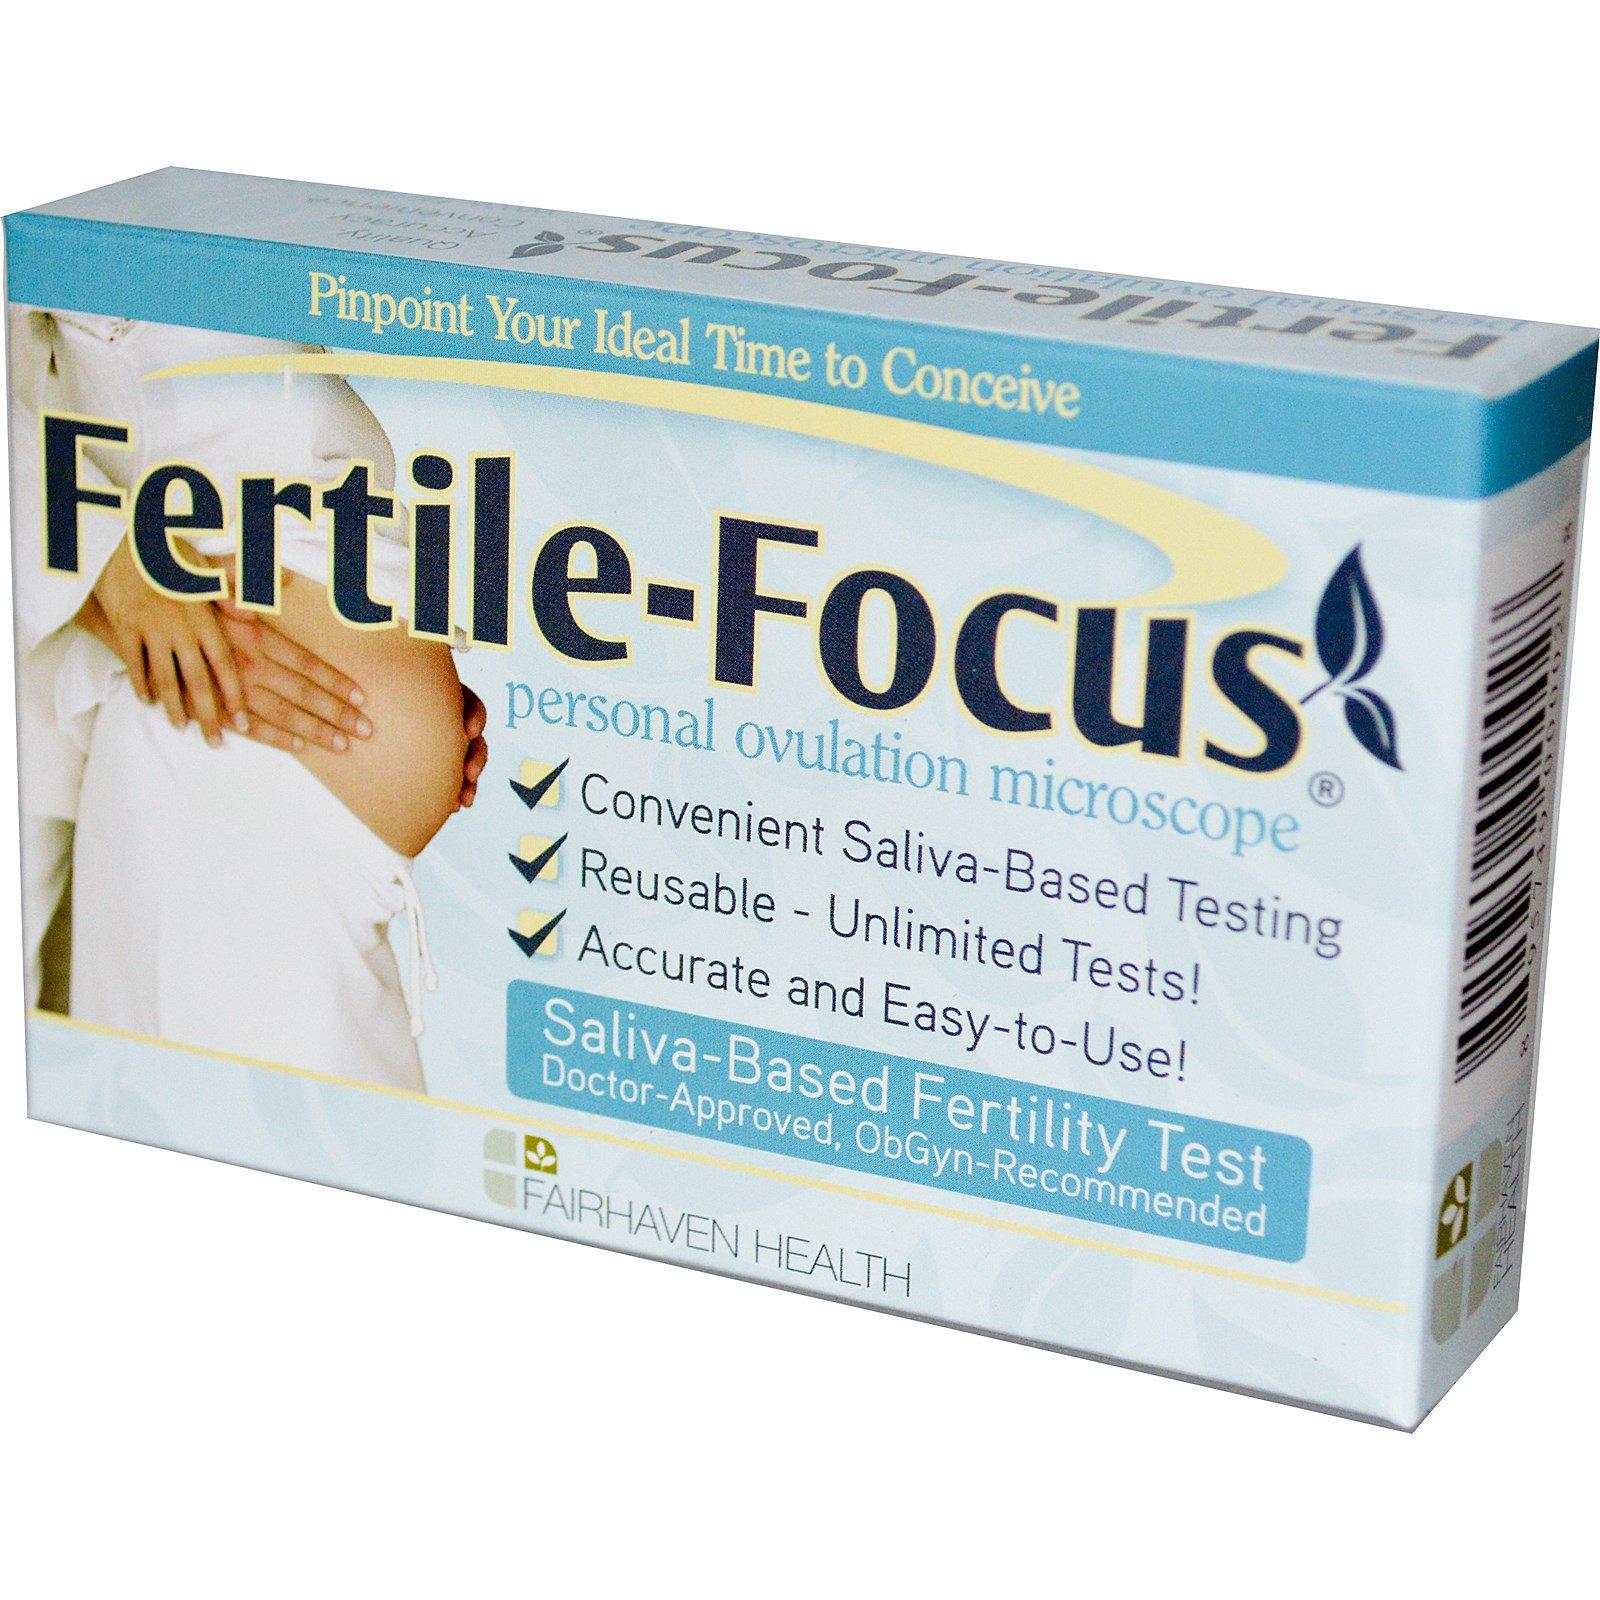 Fairhaven Health, Fertile-Focus, 1 Personal Ovulation